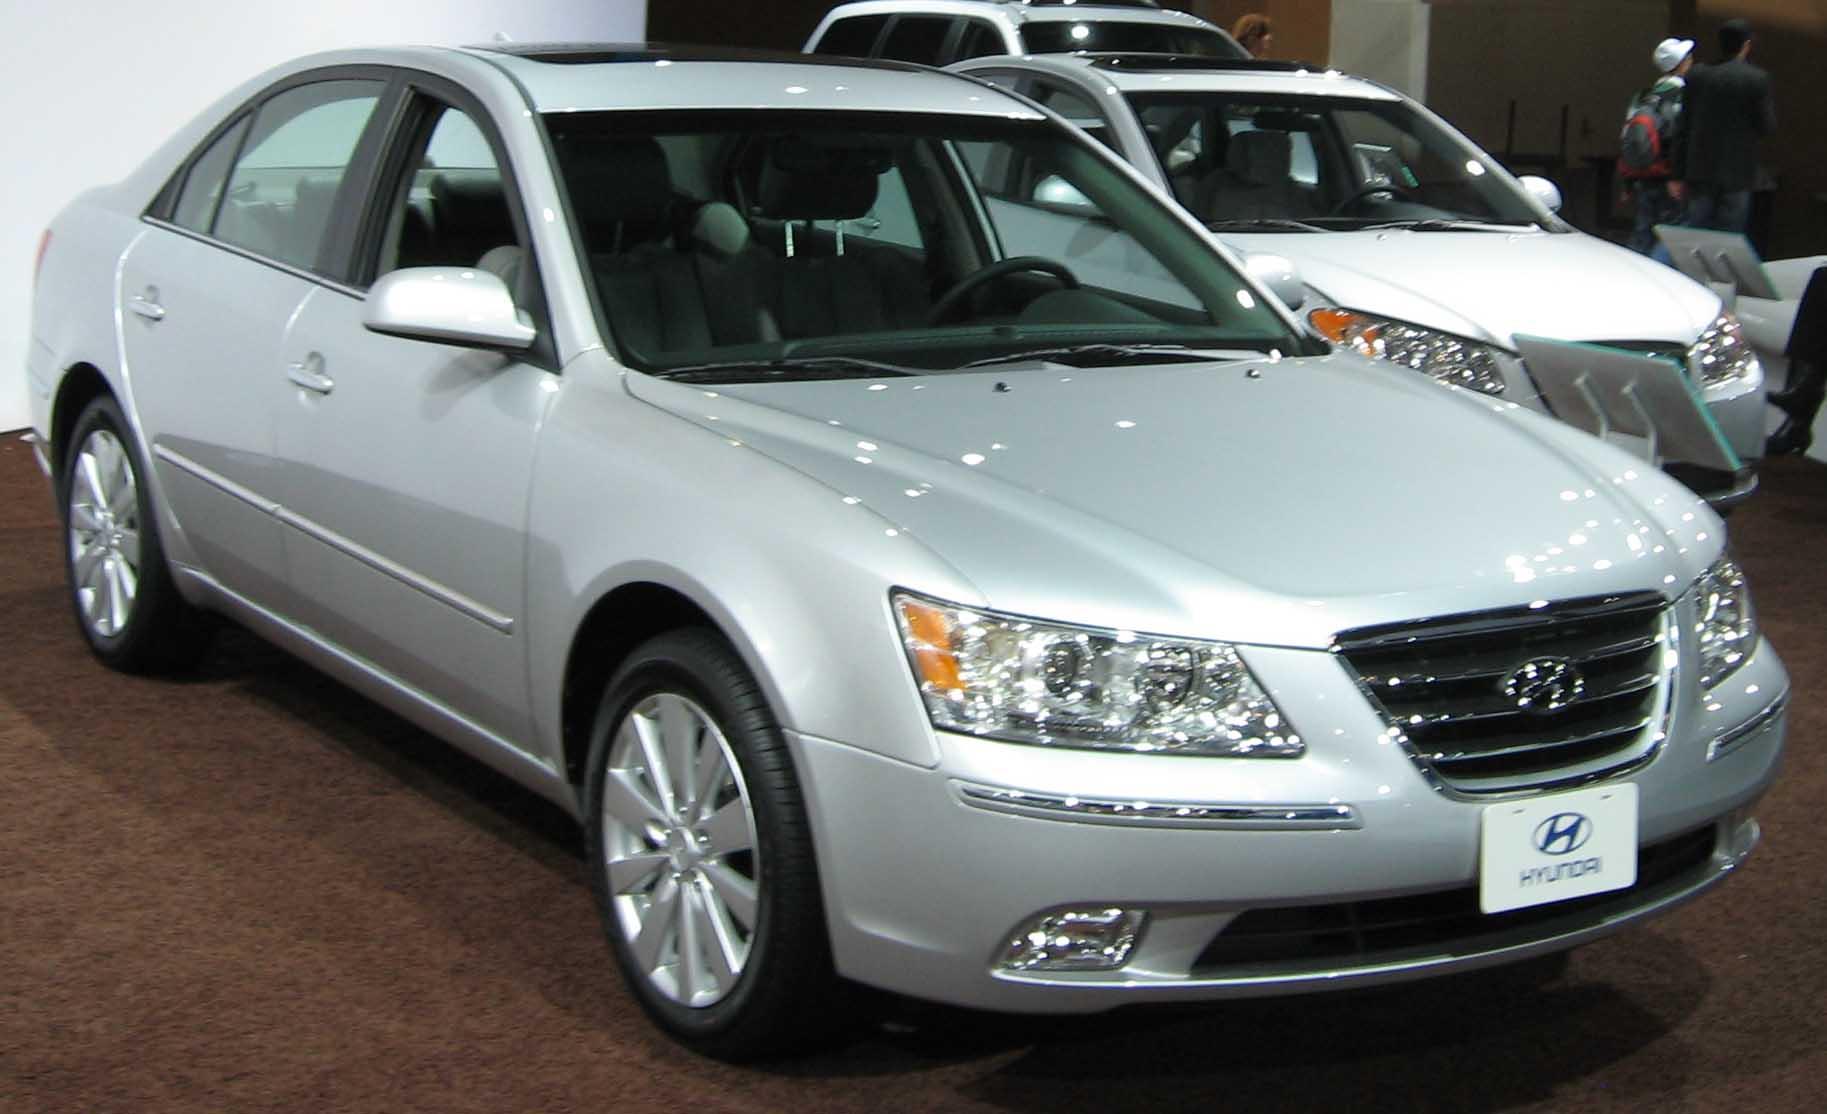 2009 Hyundai Sonata Wallpaper